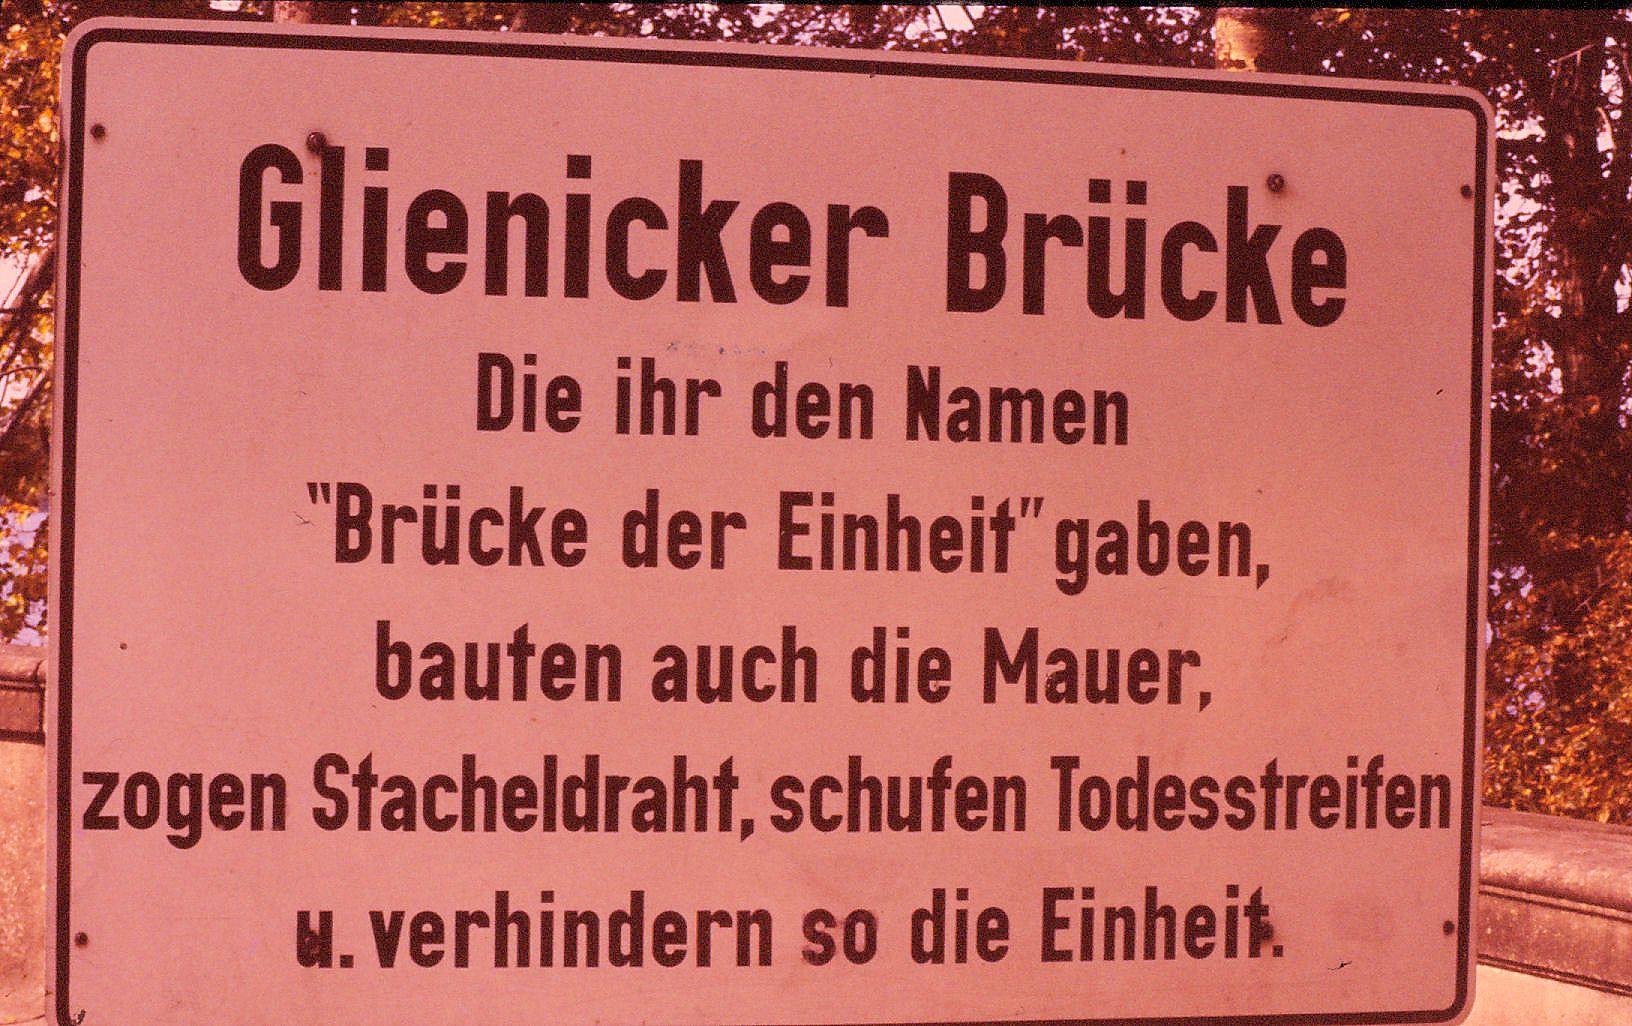 Glienicker Brucke